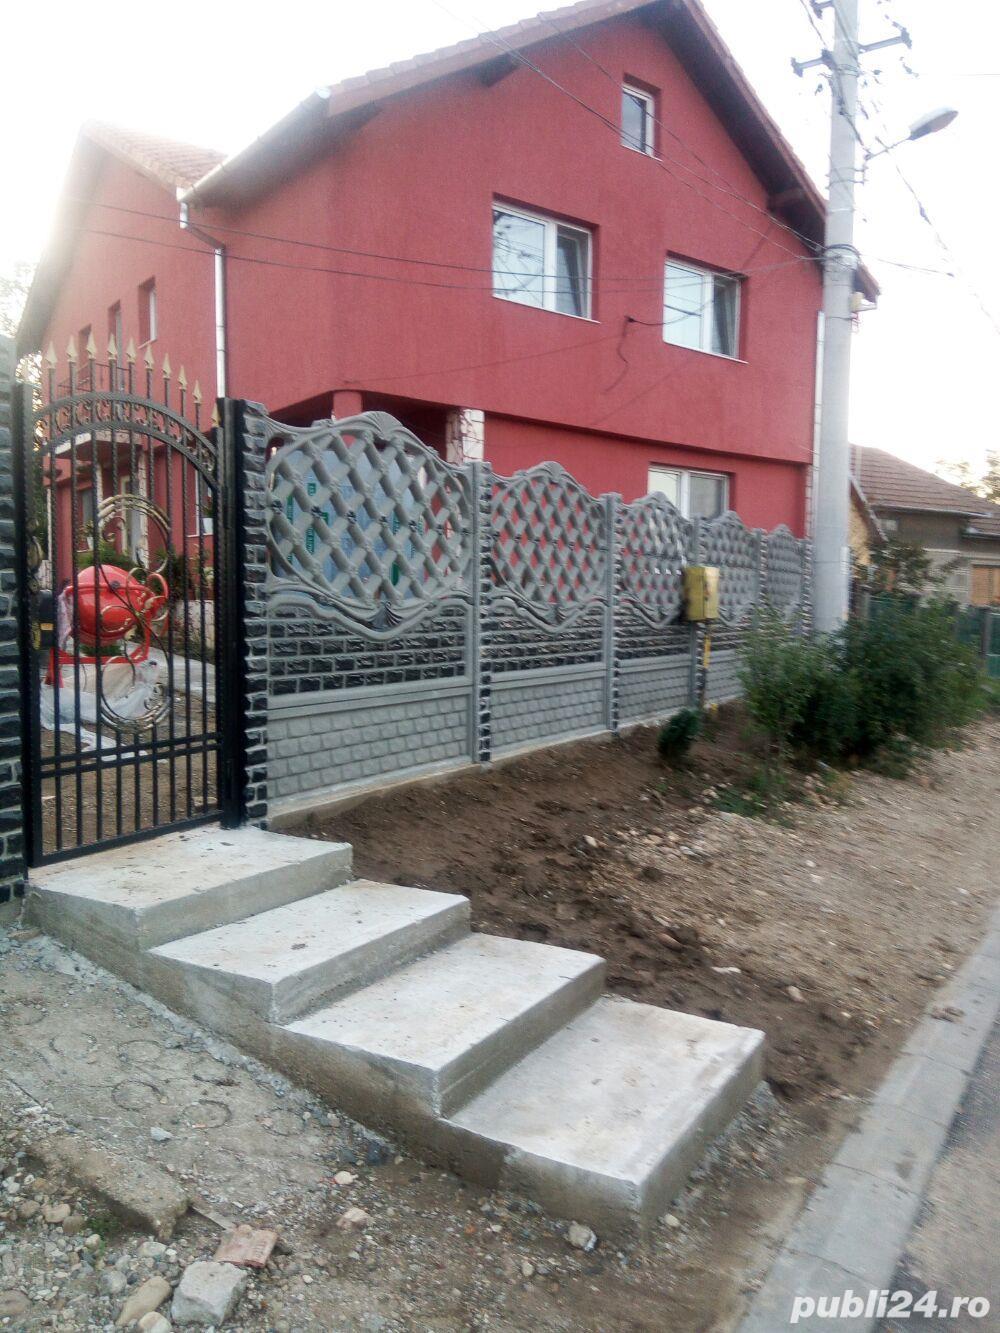 Vand sau schimb vila in Simeria cu vila inTimisoara sau Deva